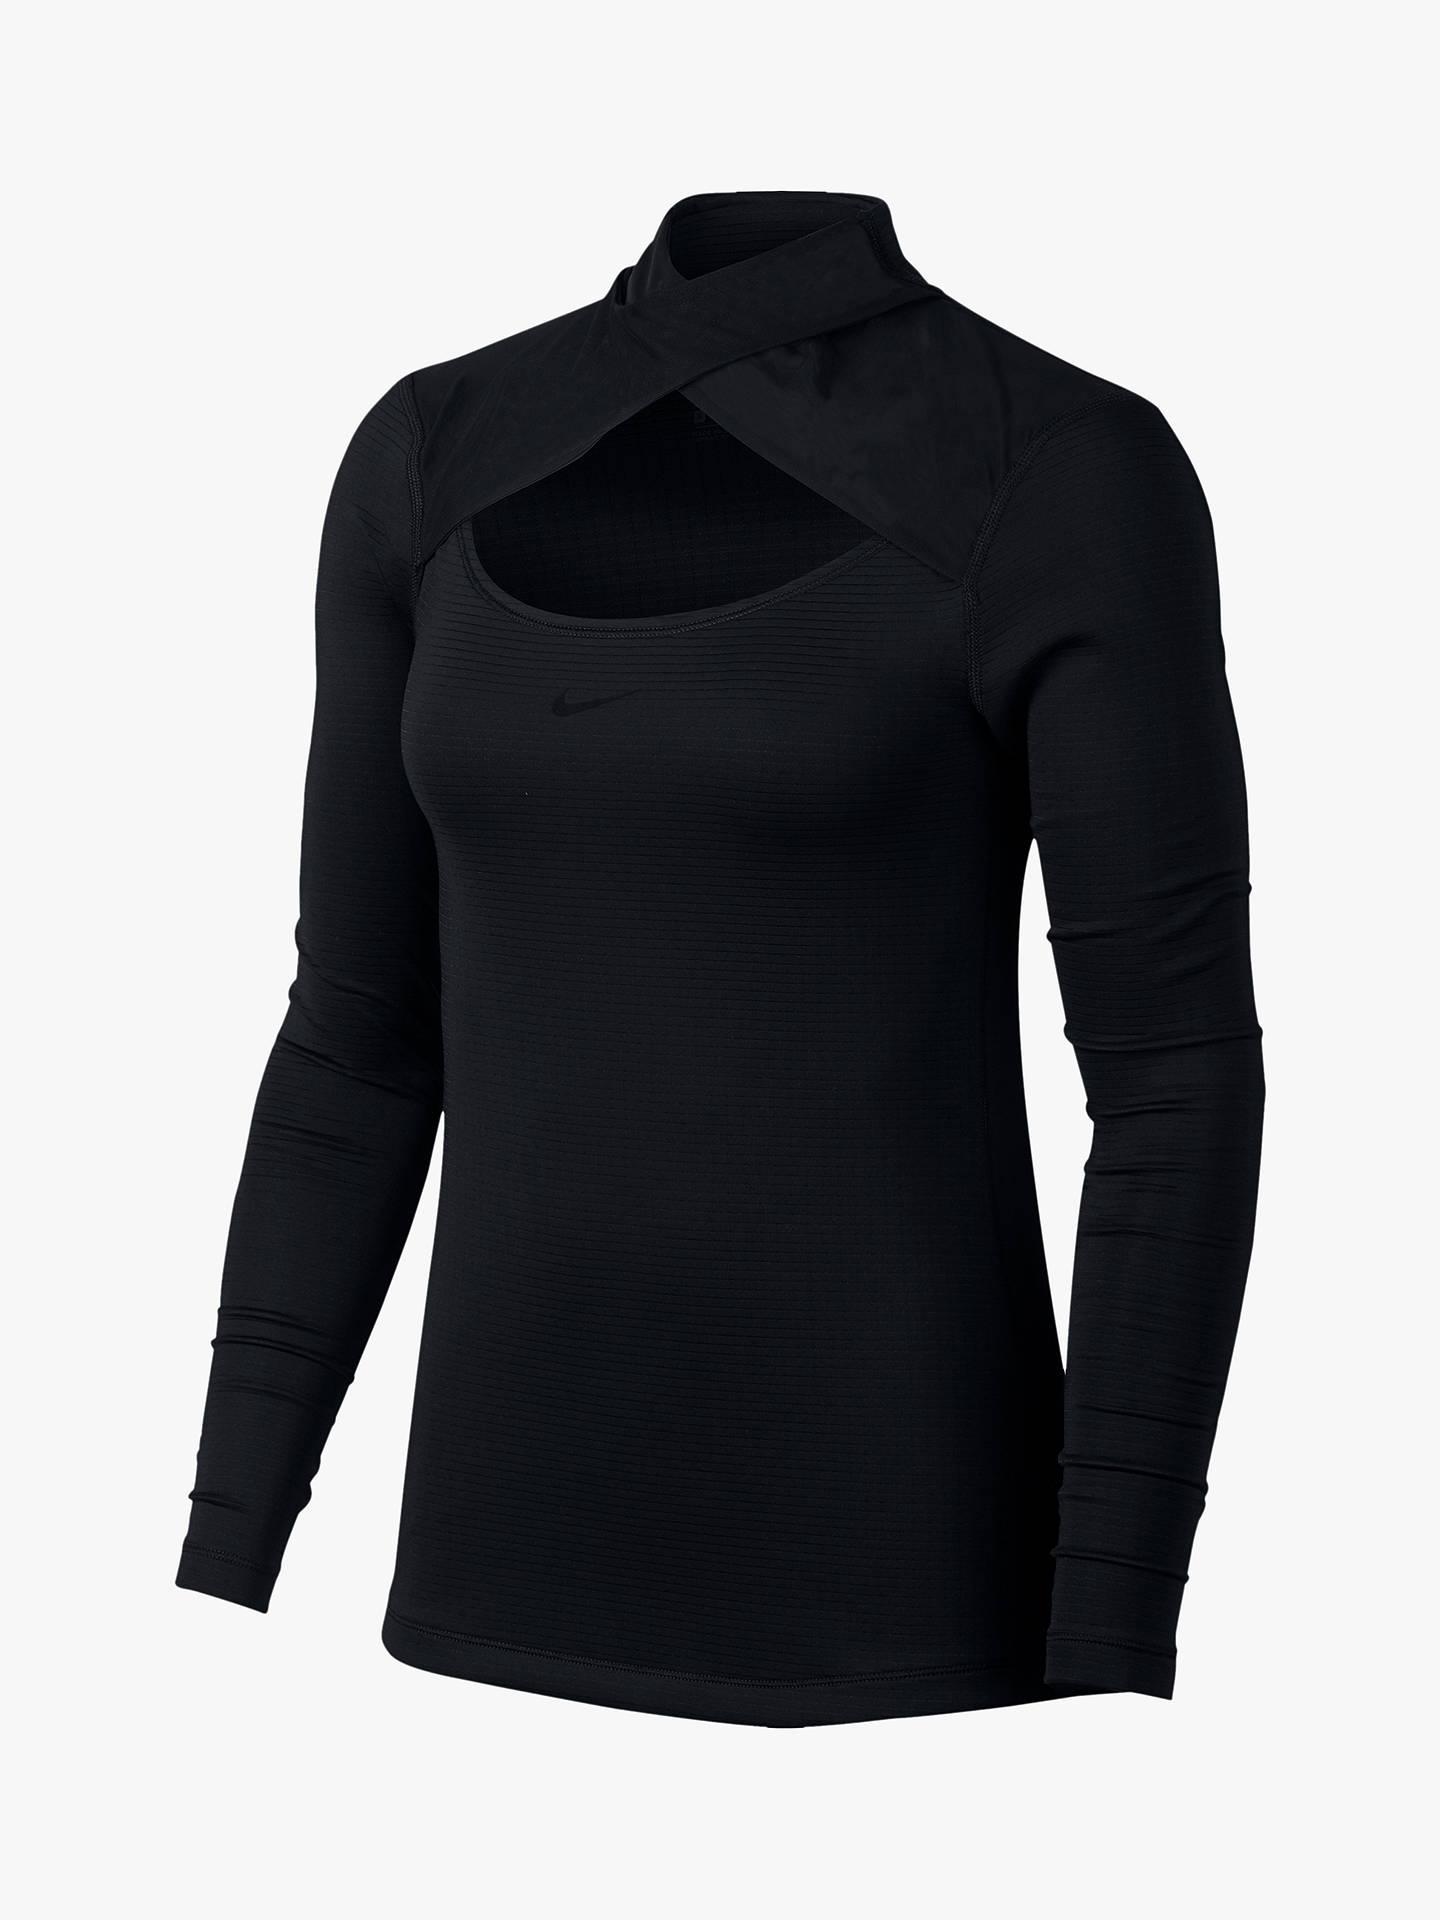 3922f3b1 Buy Nike Pro Warm Mesh Long Sleeve Top, Black, XS Online at johnlewis.